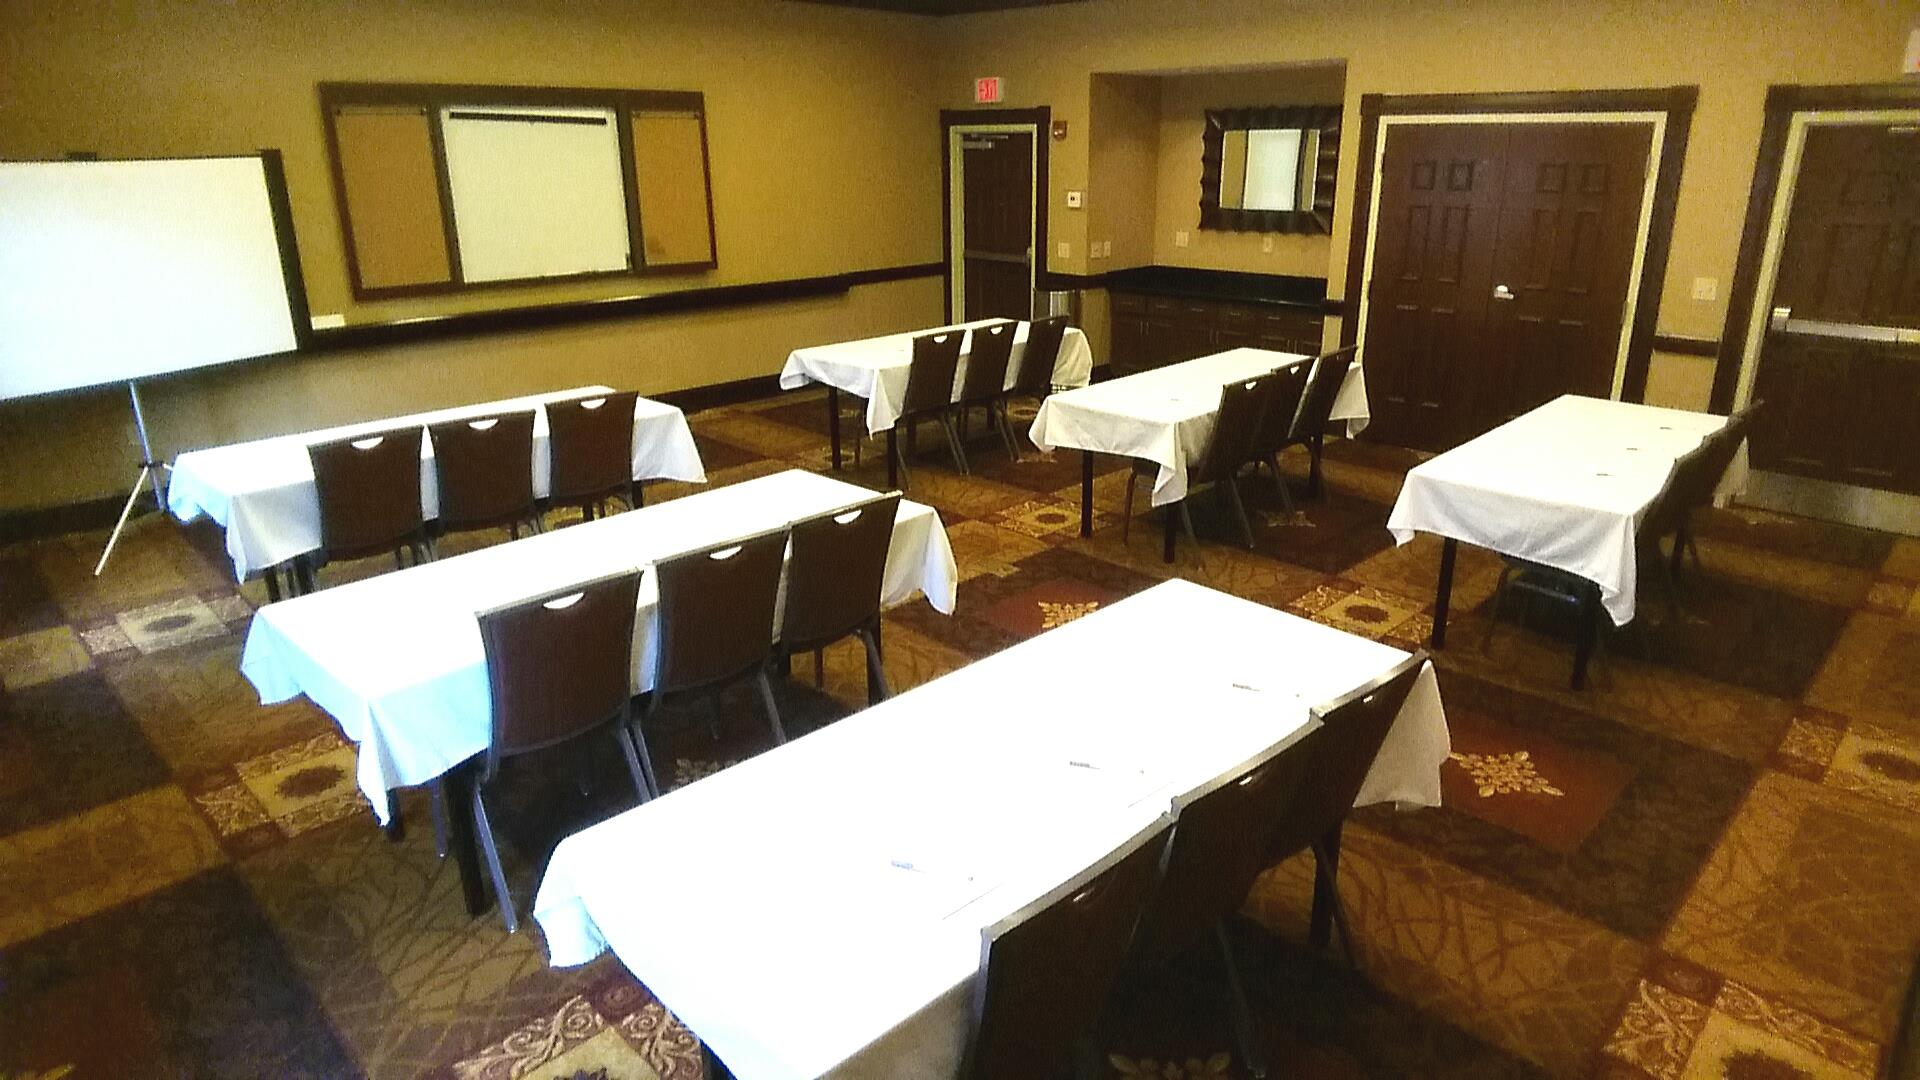 Hampton Inn & Suites Glen Mills - The Wyeth Room